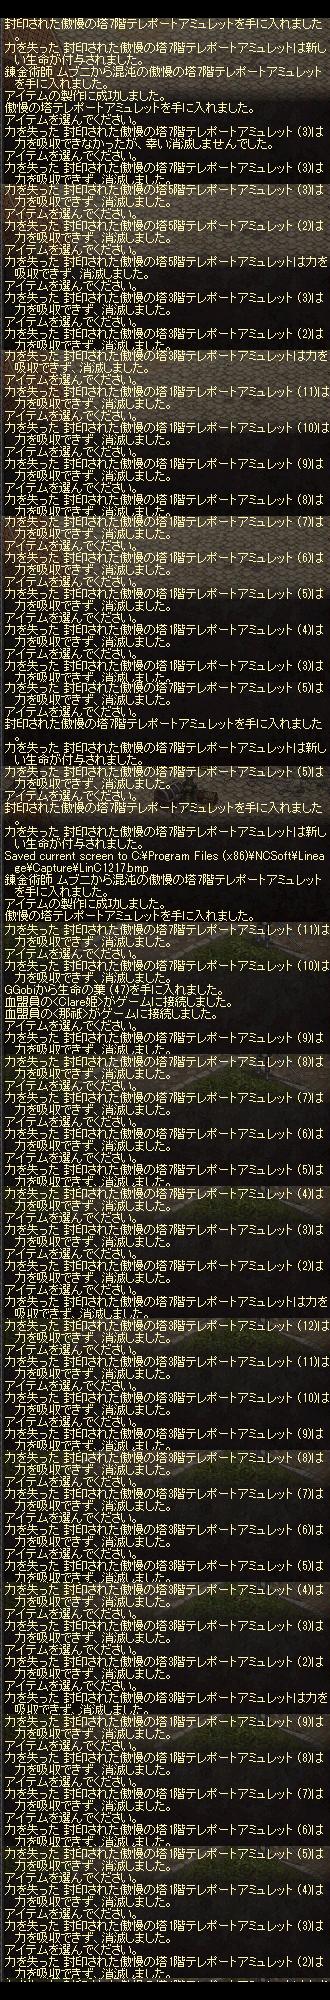 LinC1212-1